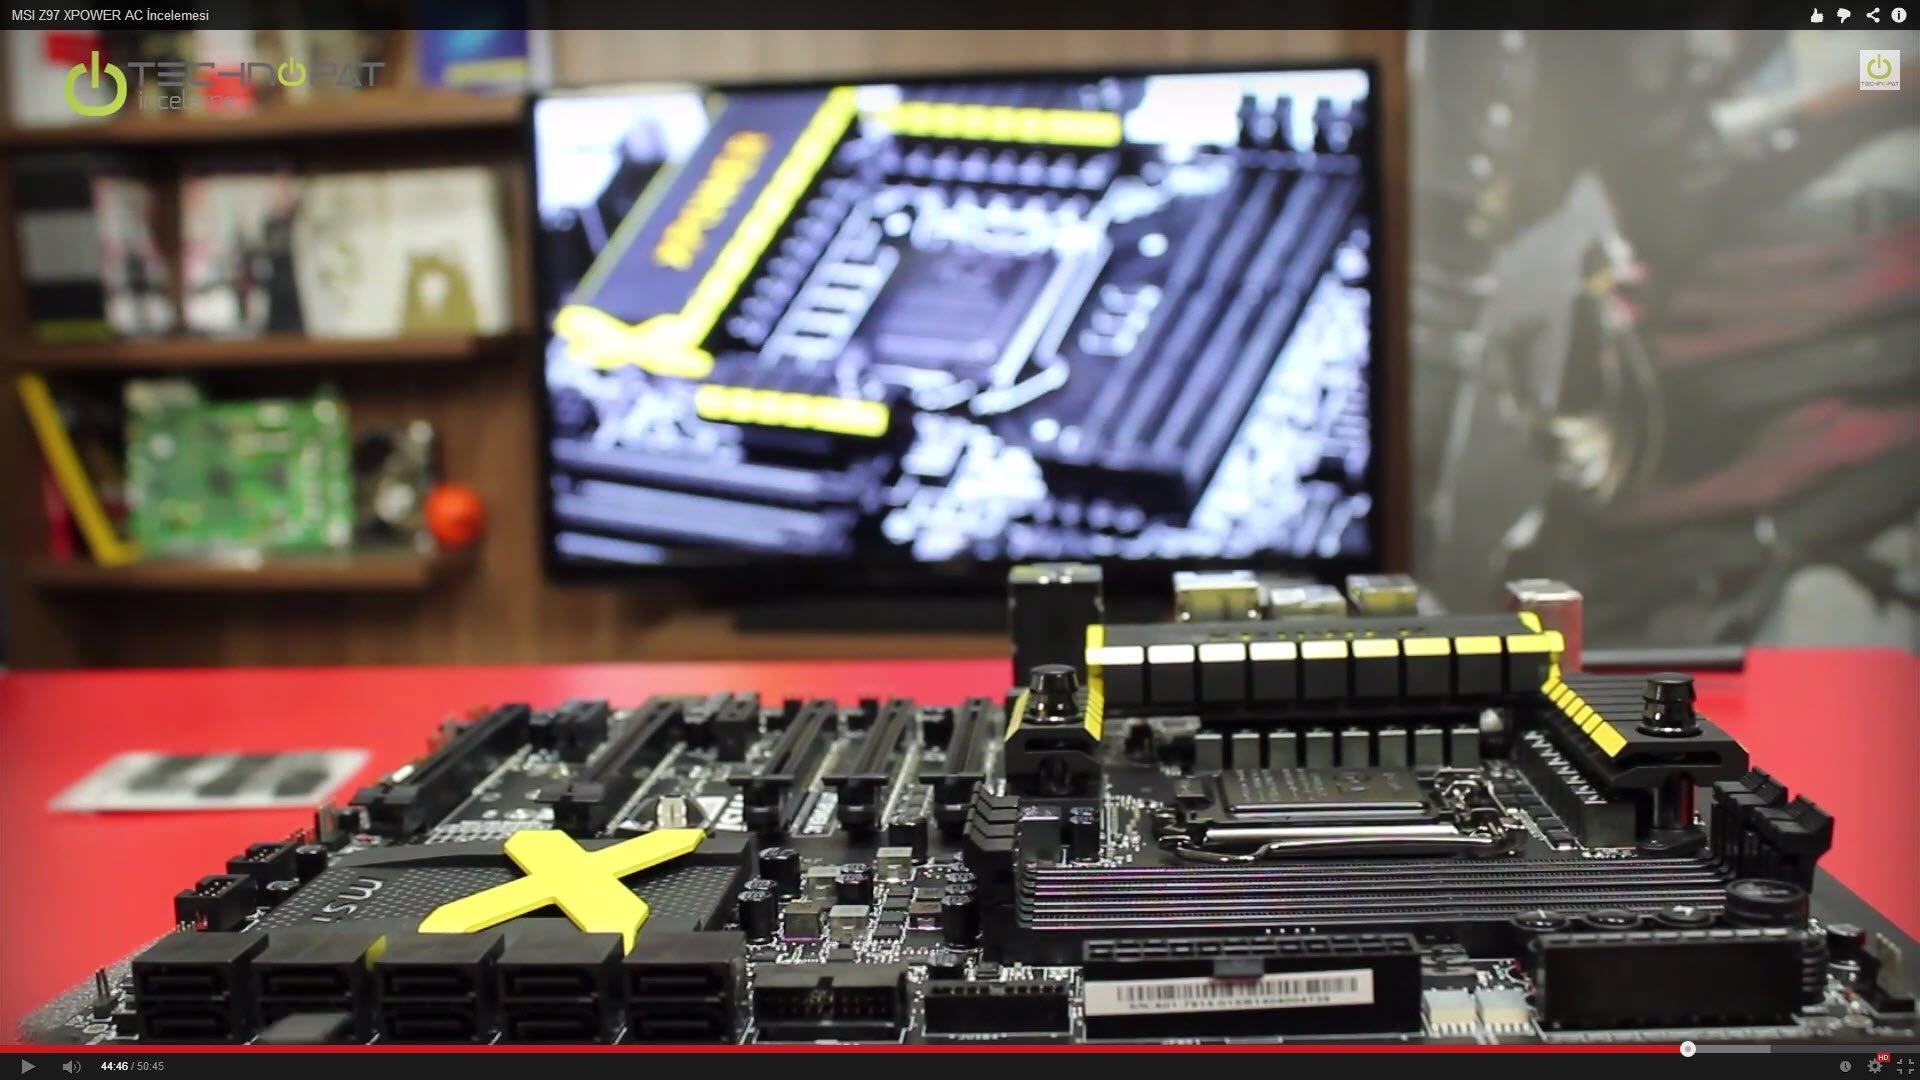 msi-z97-xpower-ac-anakart-inceleme-technopat-2